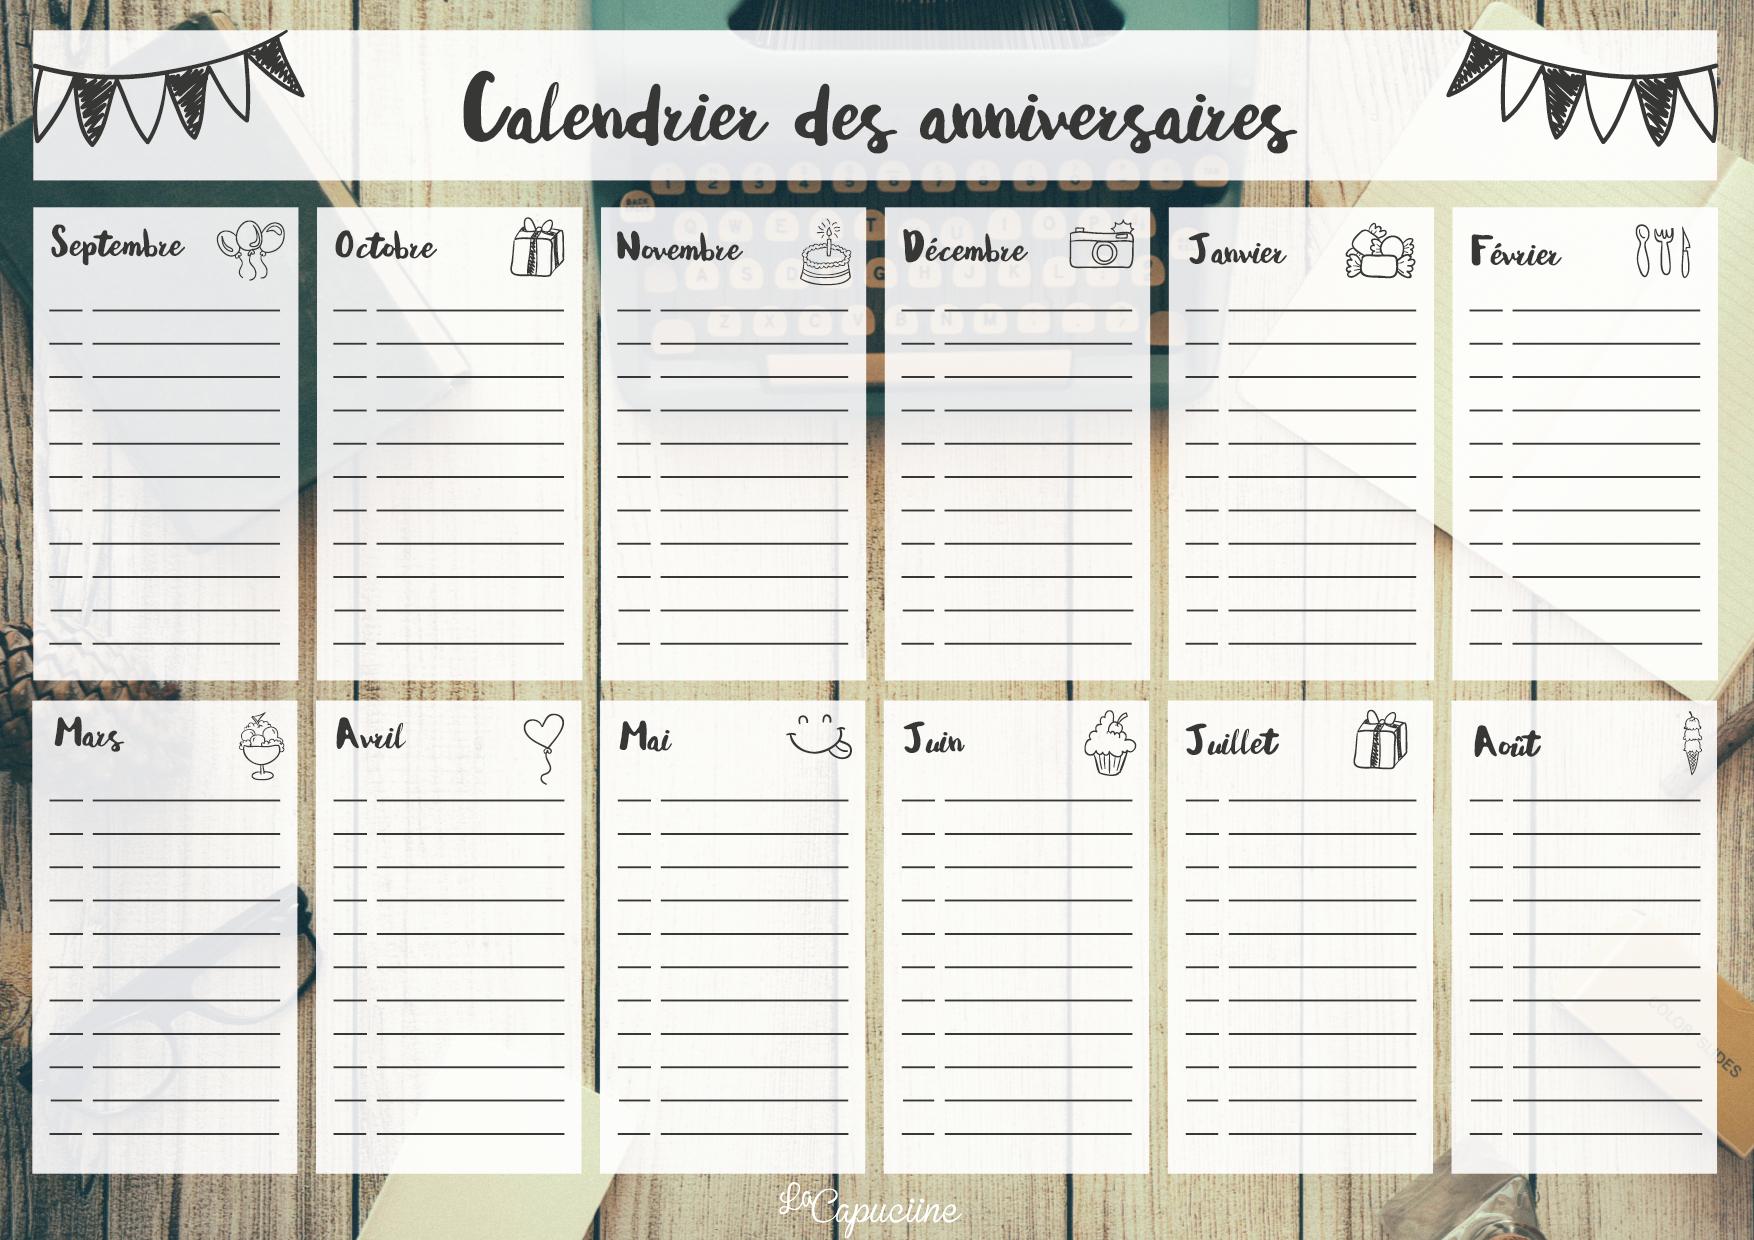 Calendrier Des Anniversaires | La Capuciine avec Calendrier Des Anniversaires À Imprimer